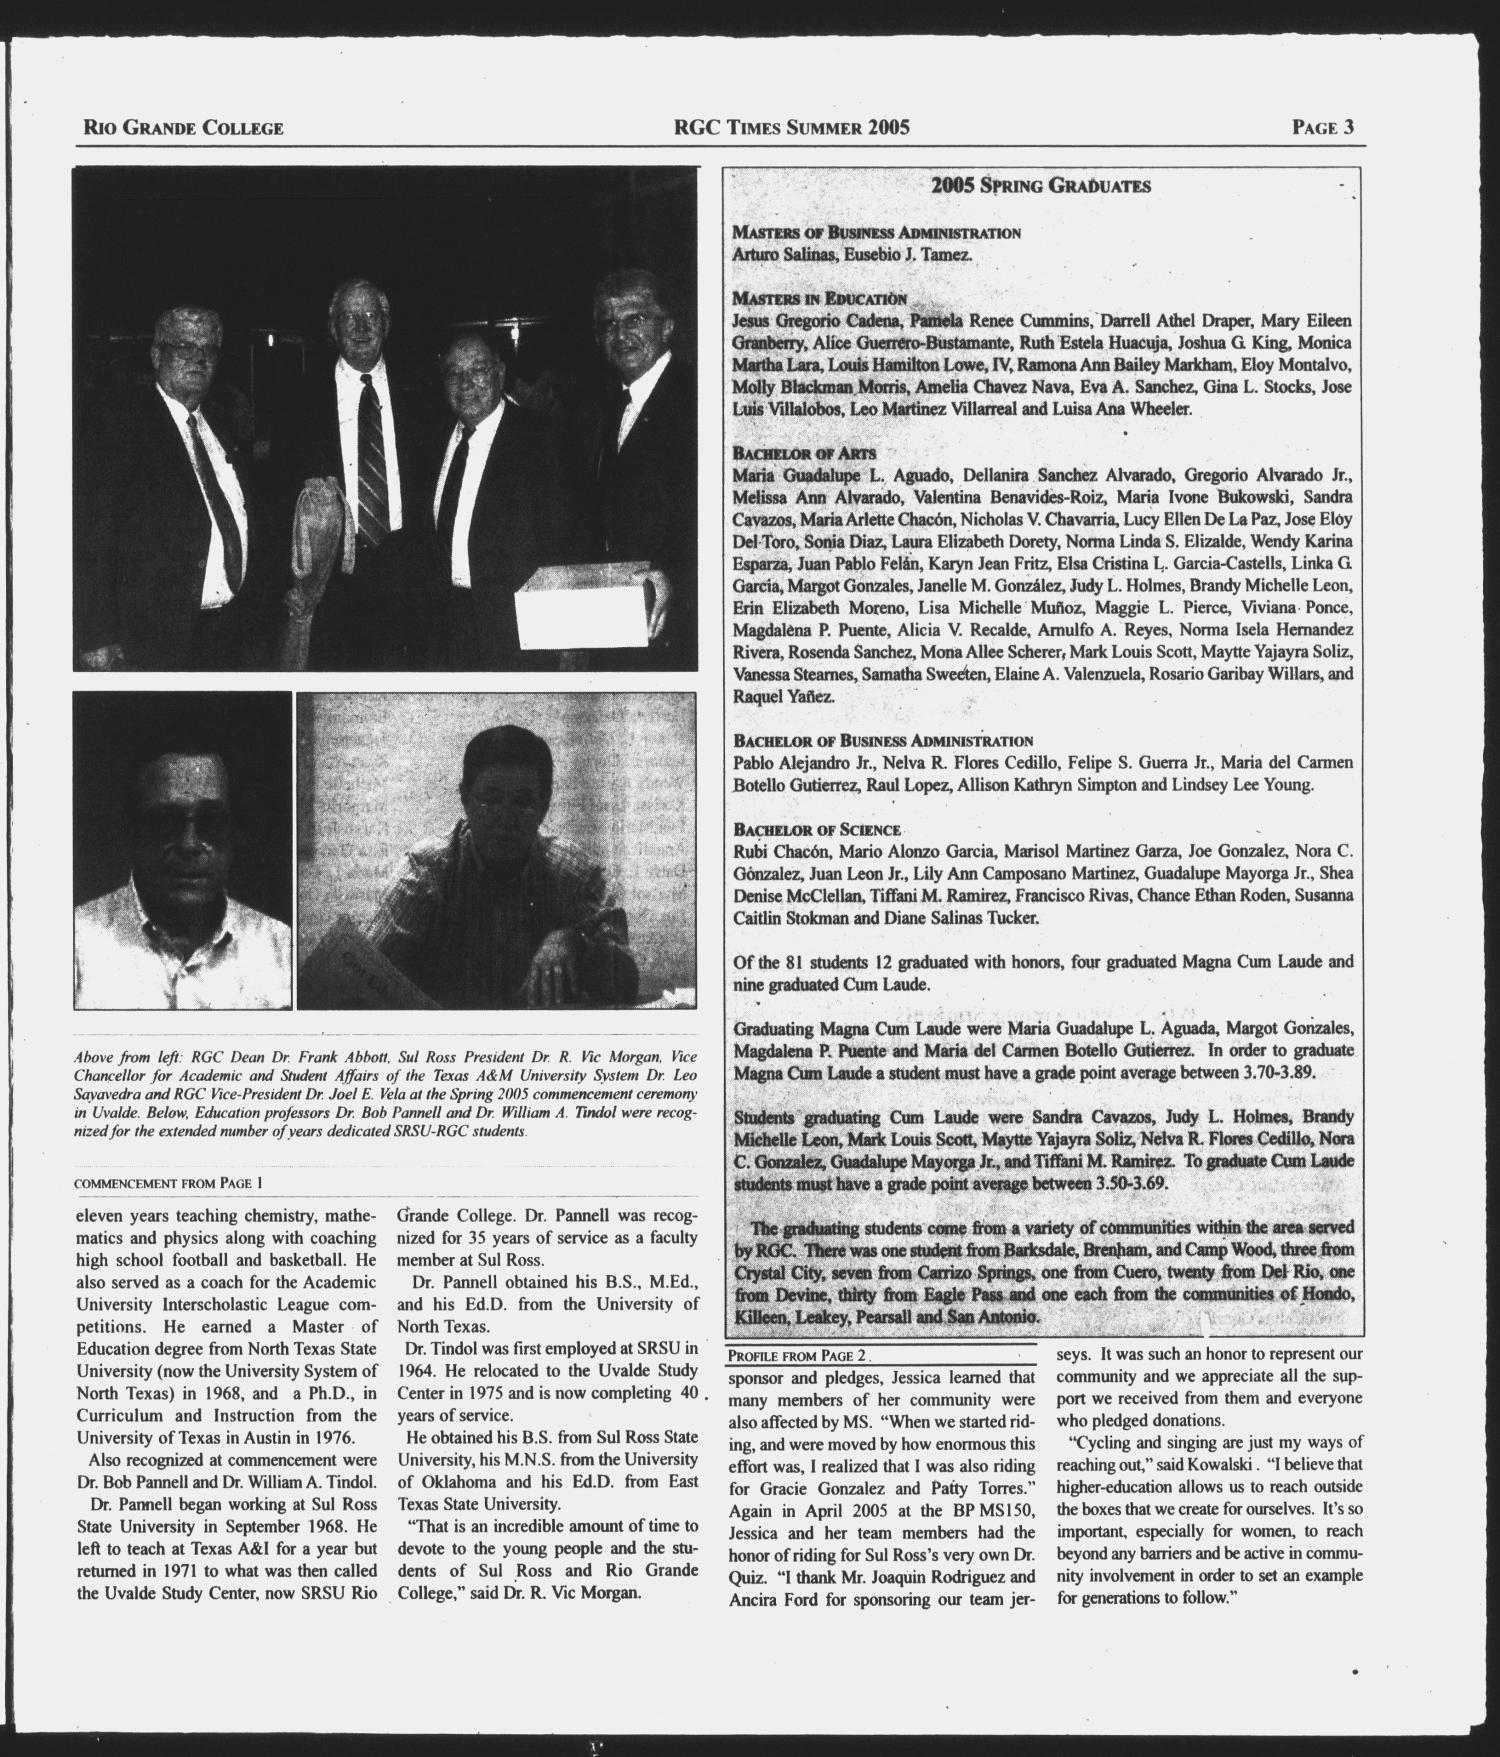 Hondo Anvil Herald (Hondo, Tex ), Vol  119, No  22, Ed  1